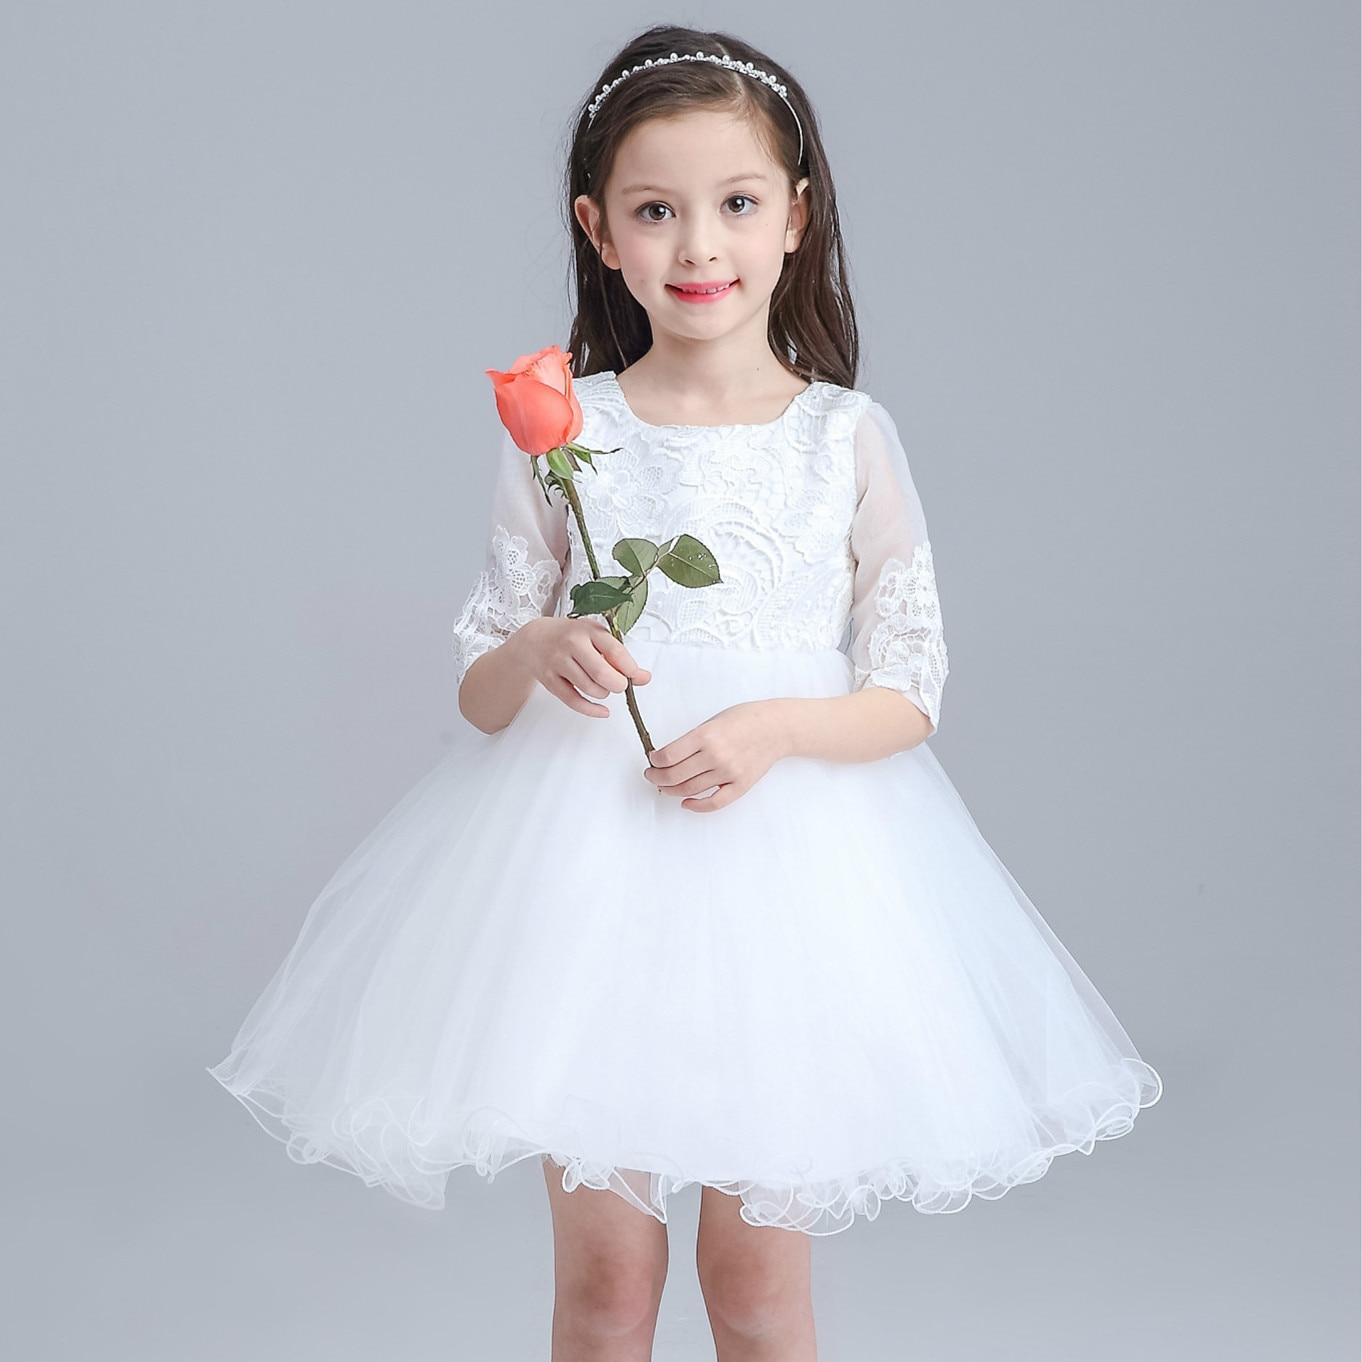 High Quality Childrens Wedding Flower Girl Dress Half Sleeved Baby Tutu Pink 0 2th Girls Princess 2017 Child Clothes Formal Fashion Akf164038